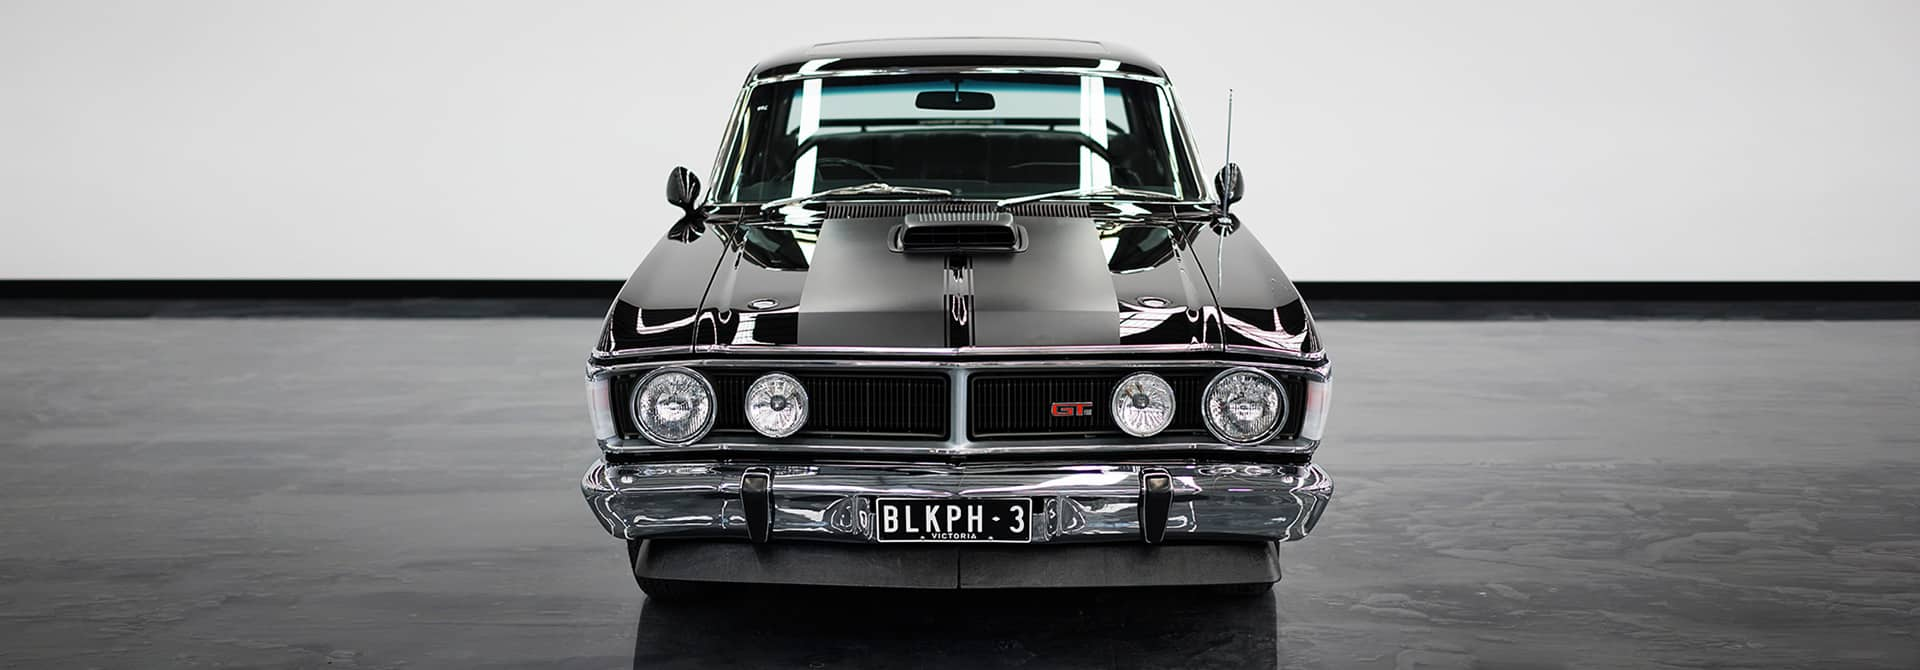 Gosford Classic Car Museum - Over 400 Classic Cars - CARLASSIC